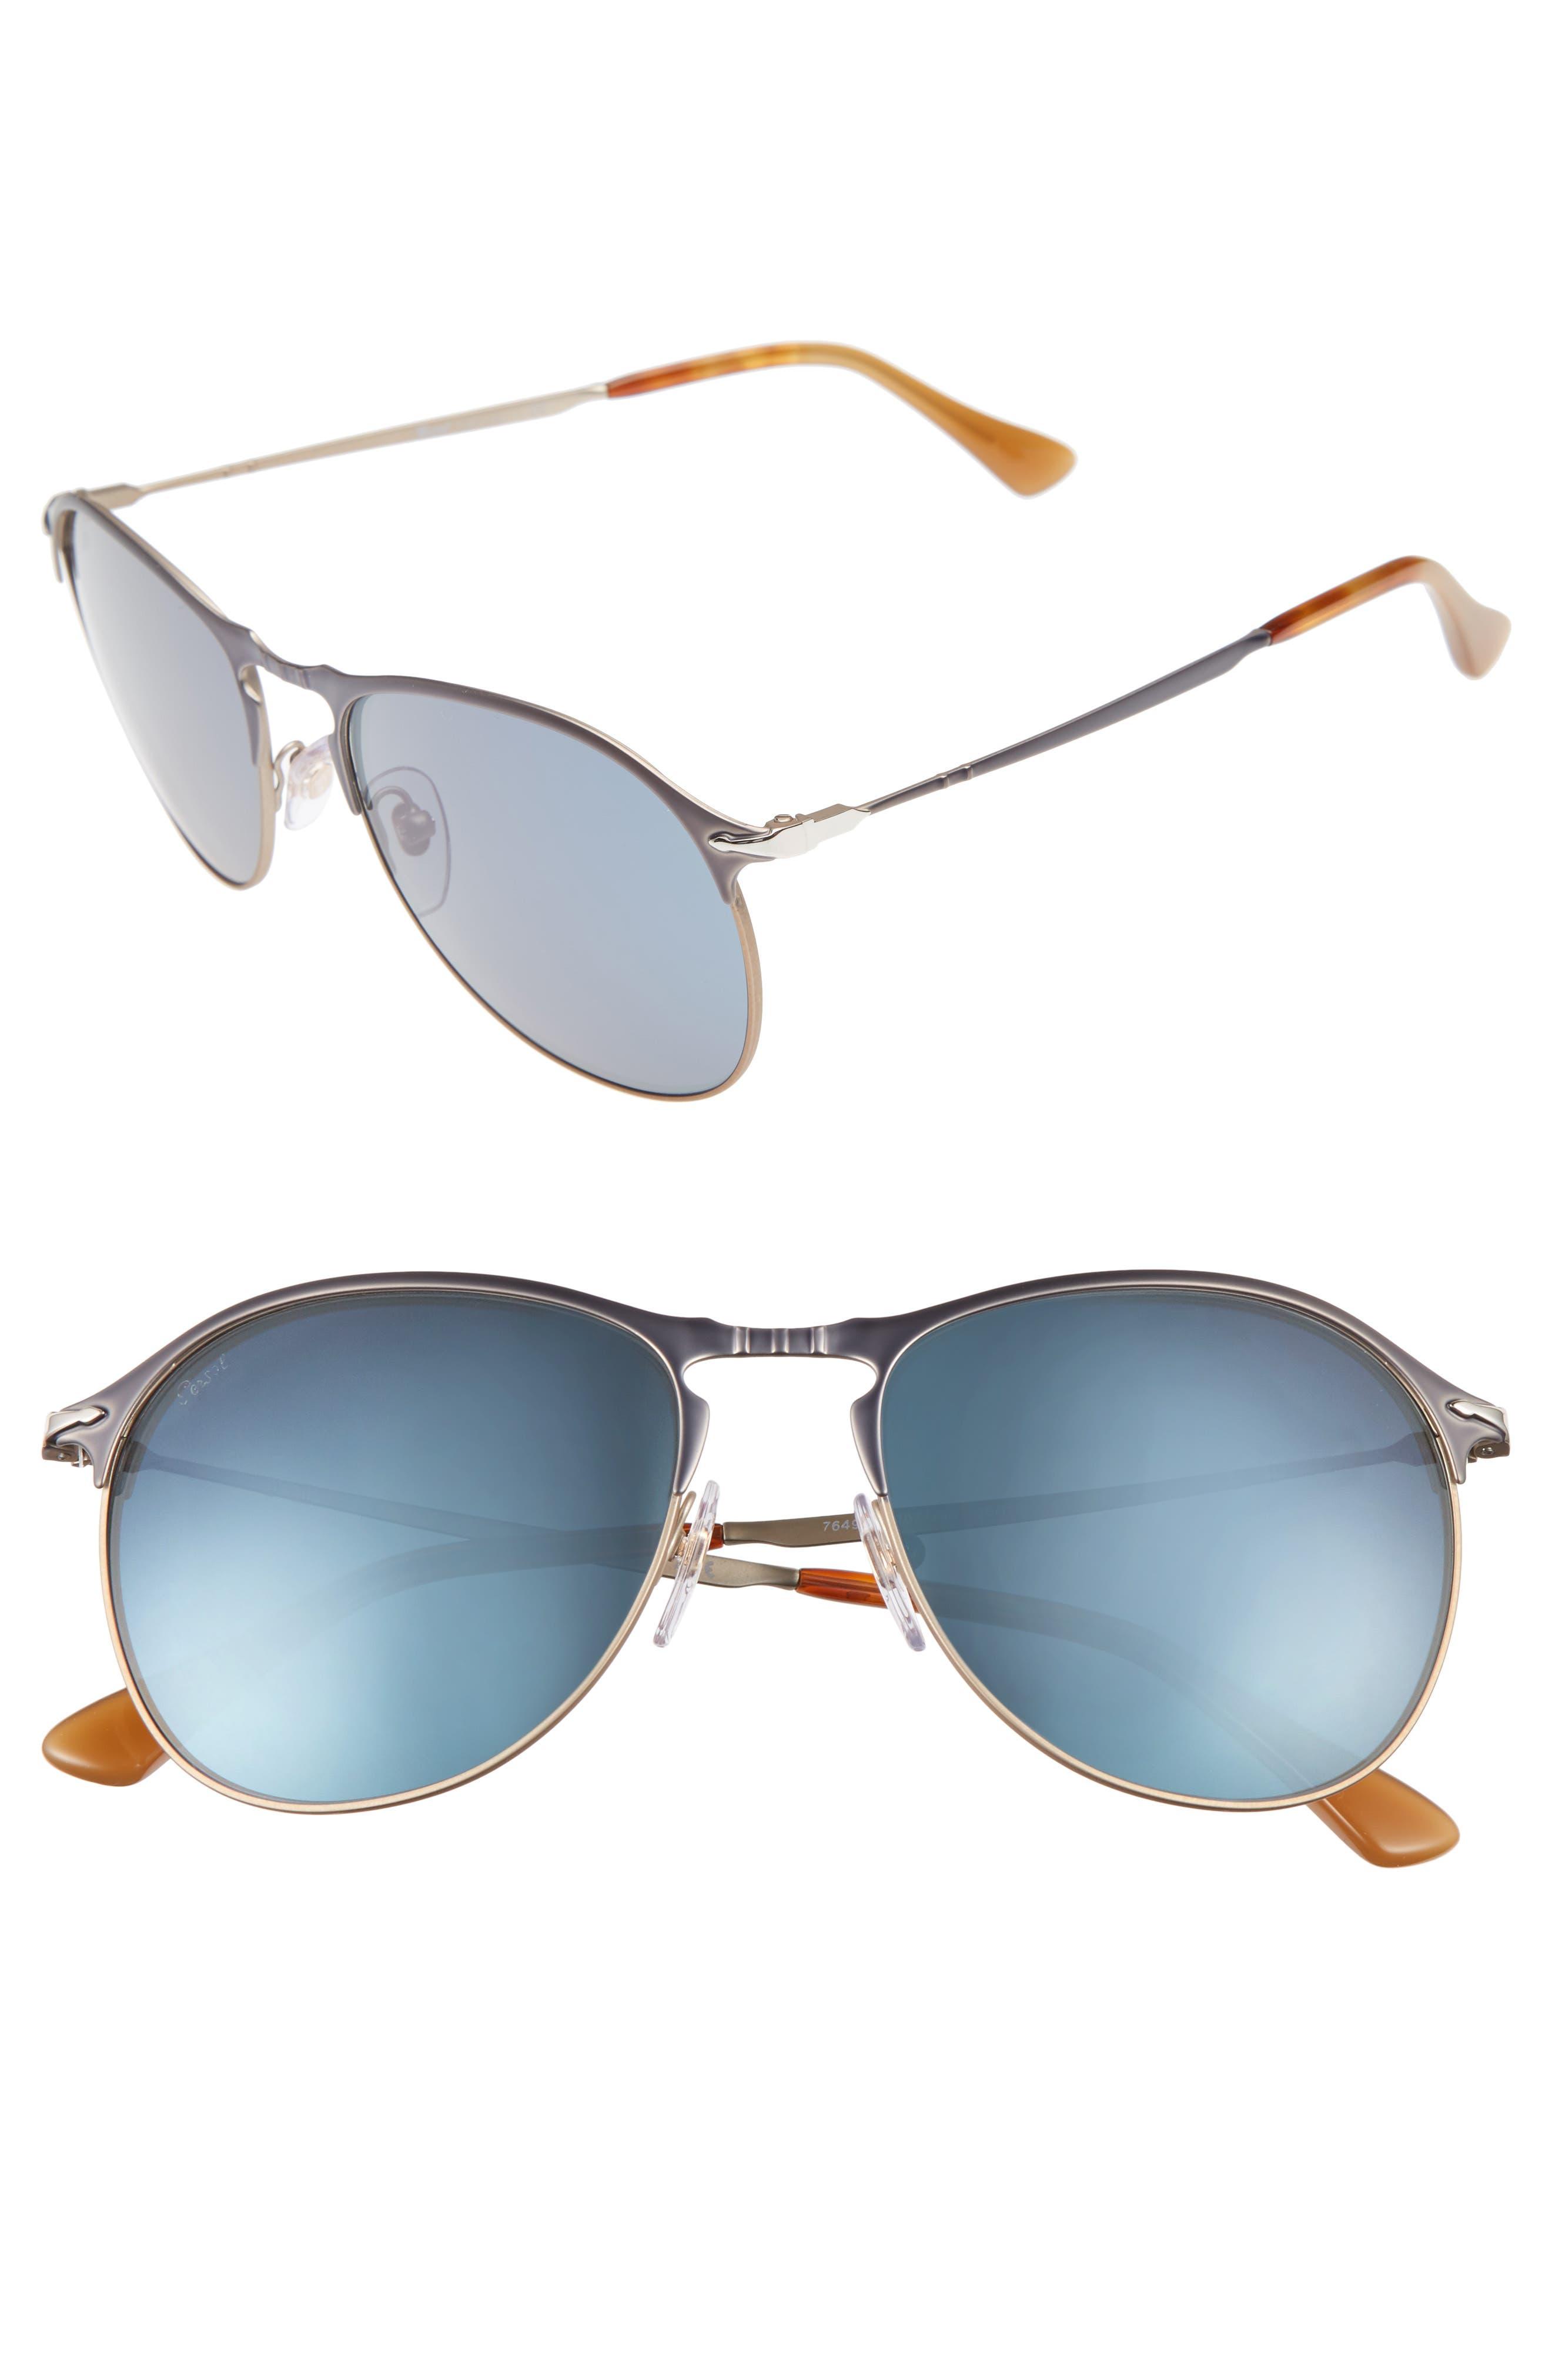 PERSOL Sartoria 56m Aviator Sunglasses